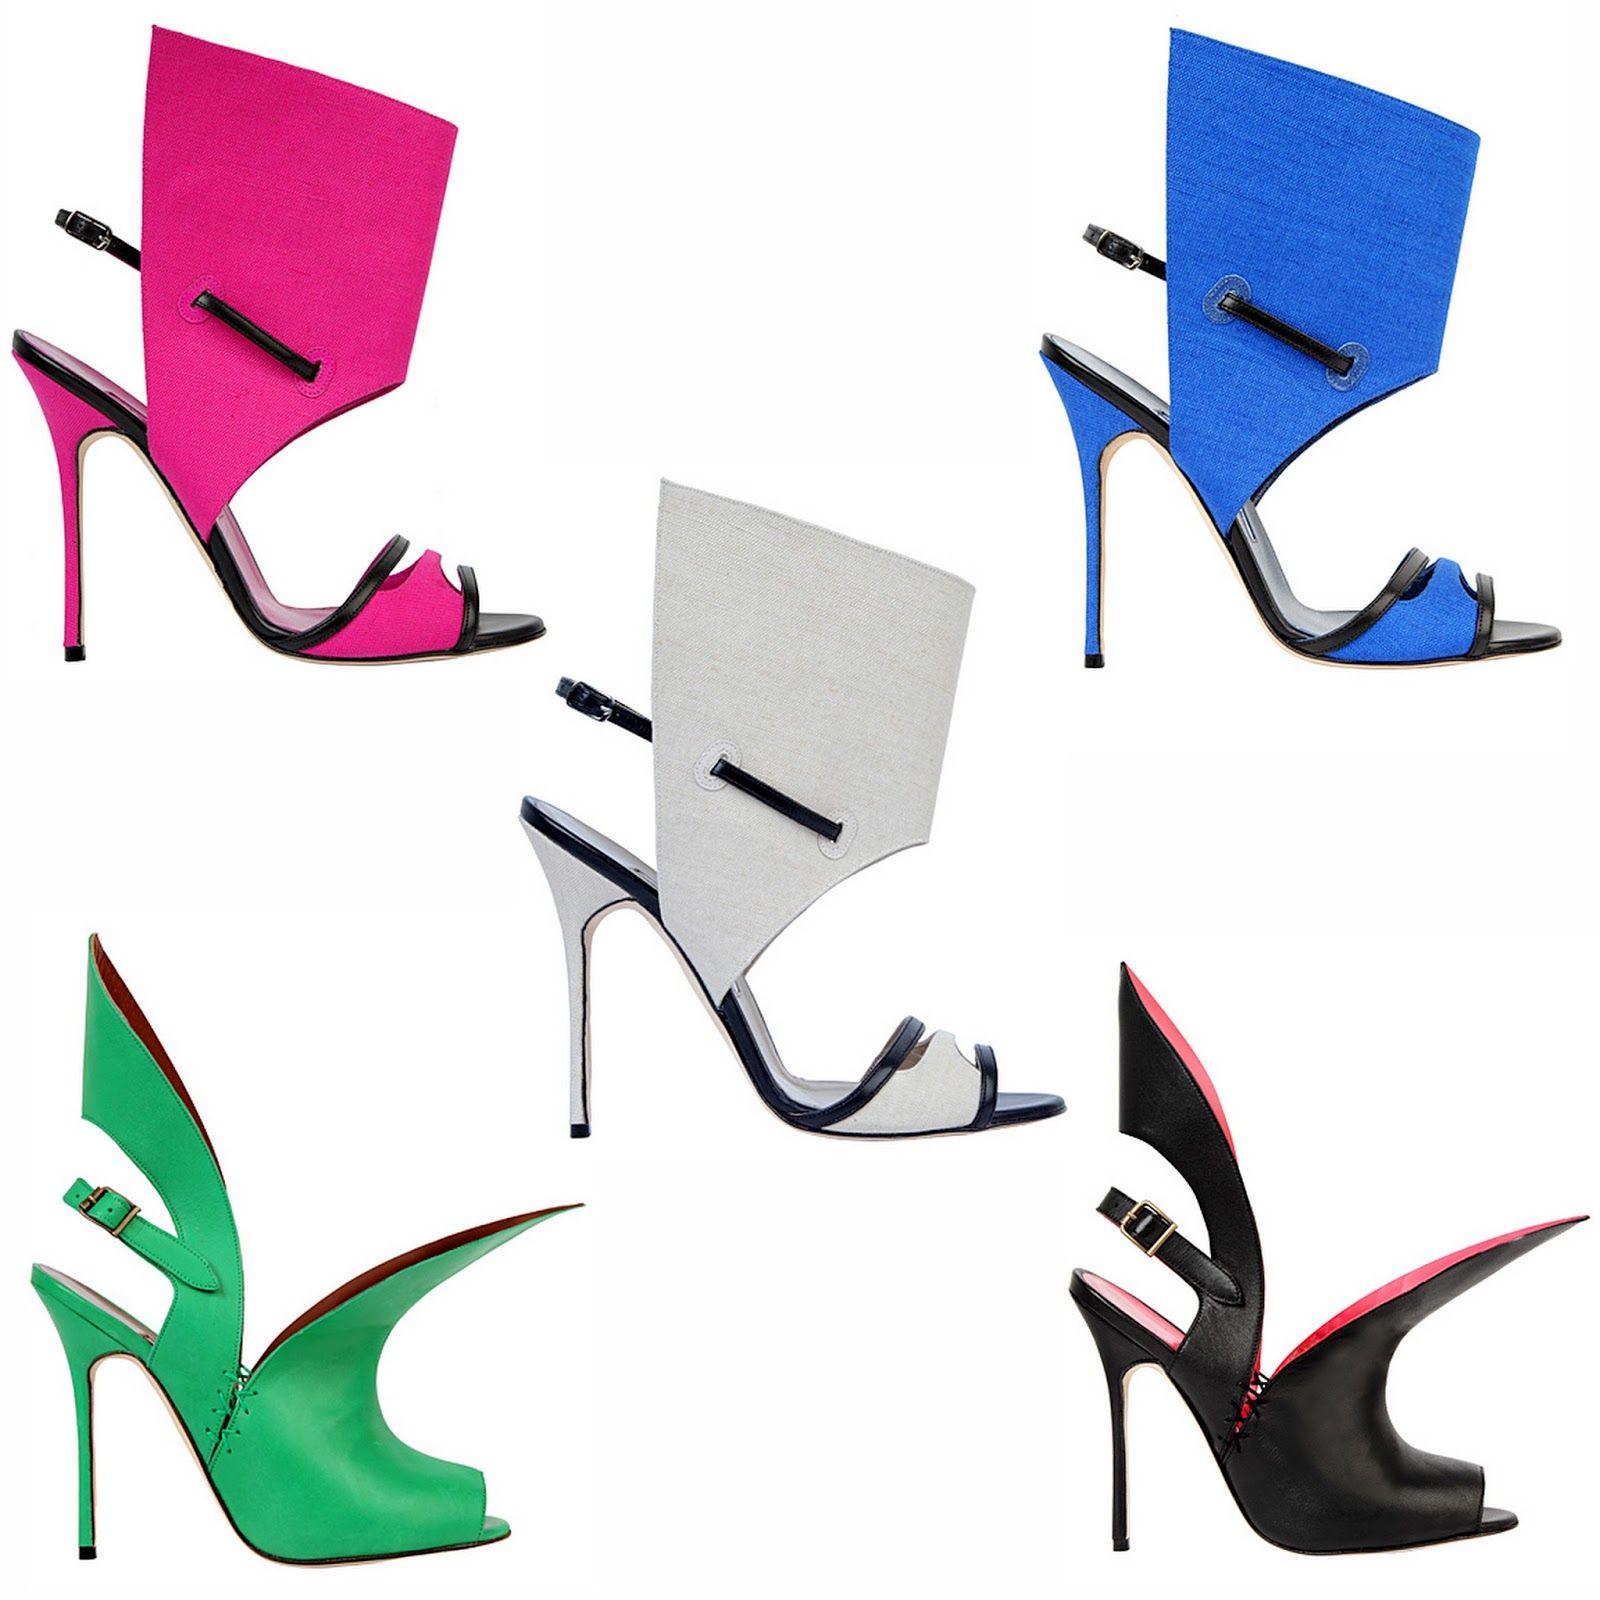 Manolo Blahnik Summer Shoes 2013 #Manolos